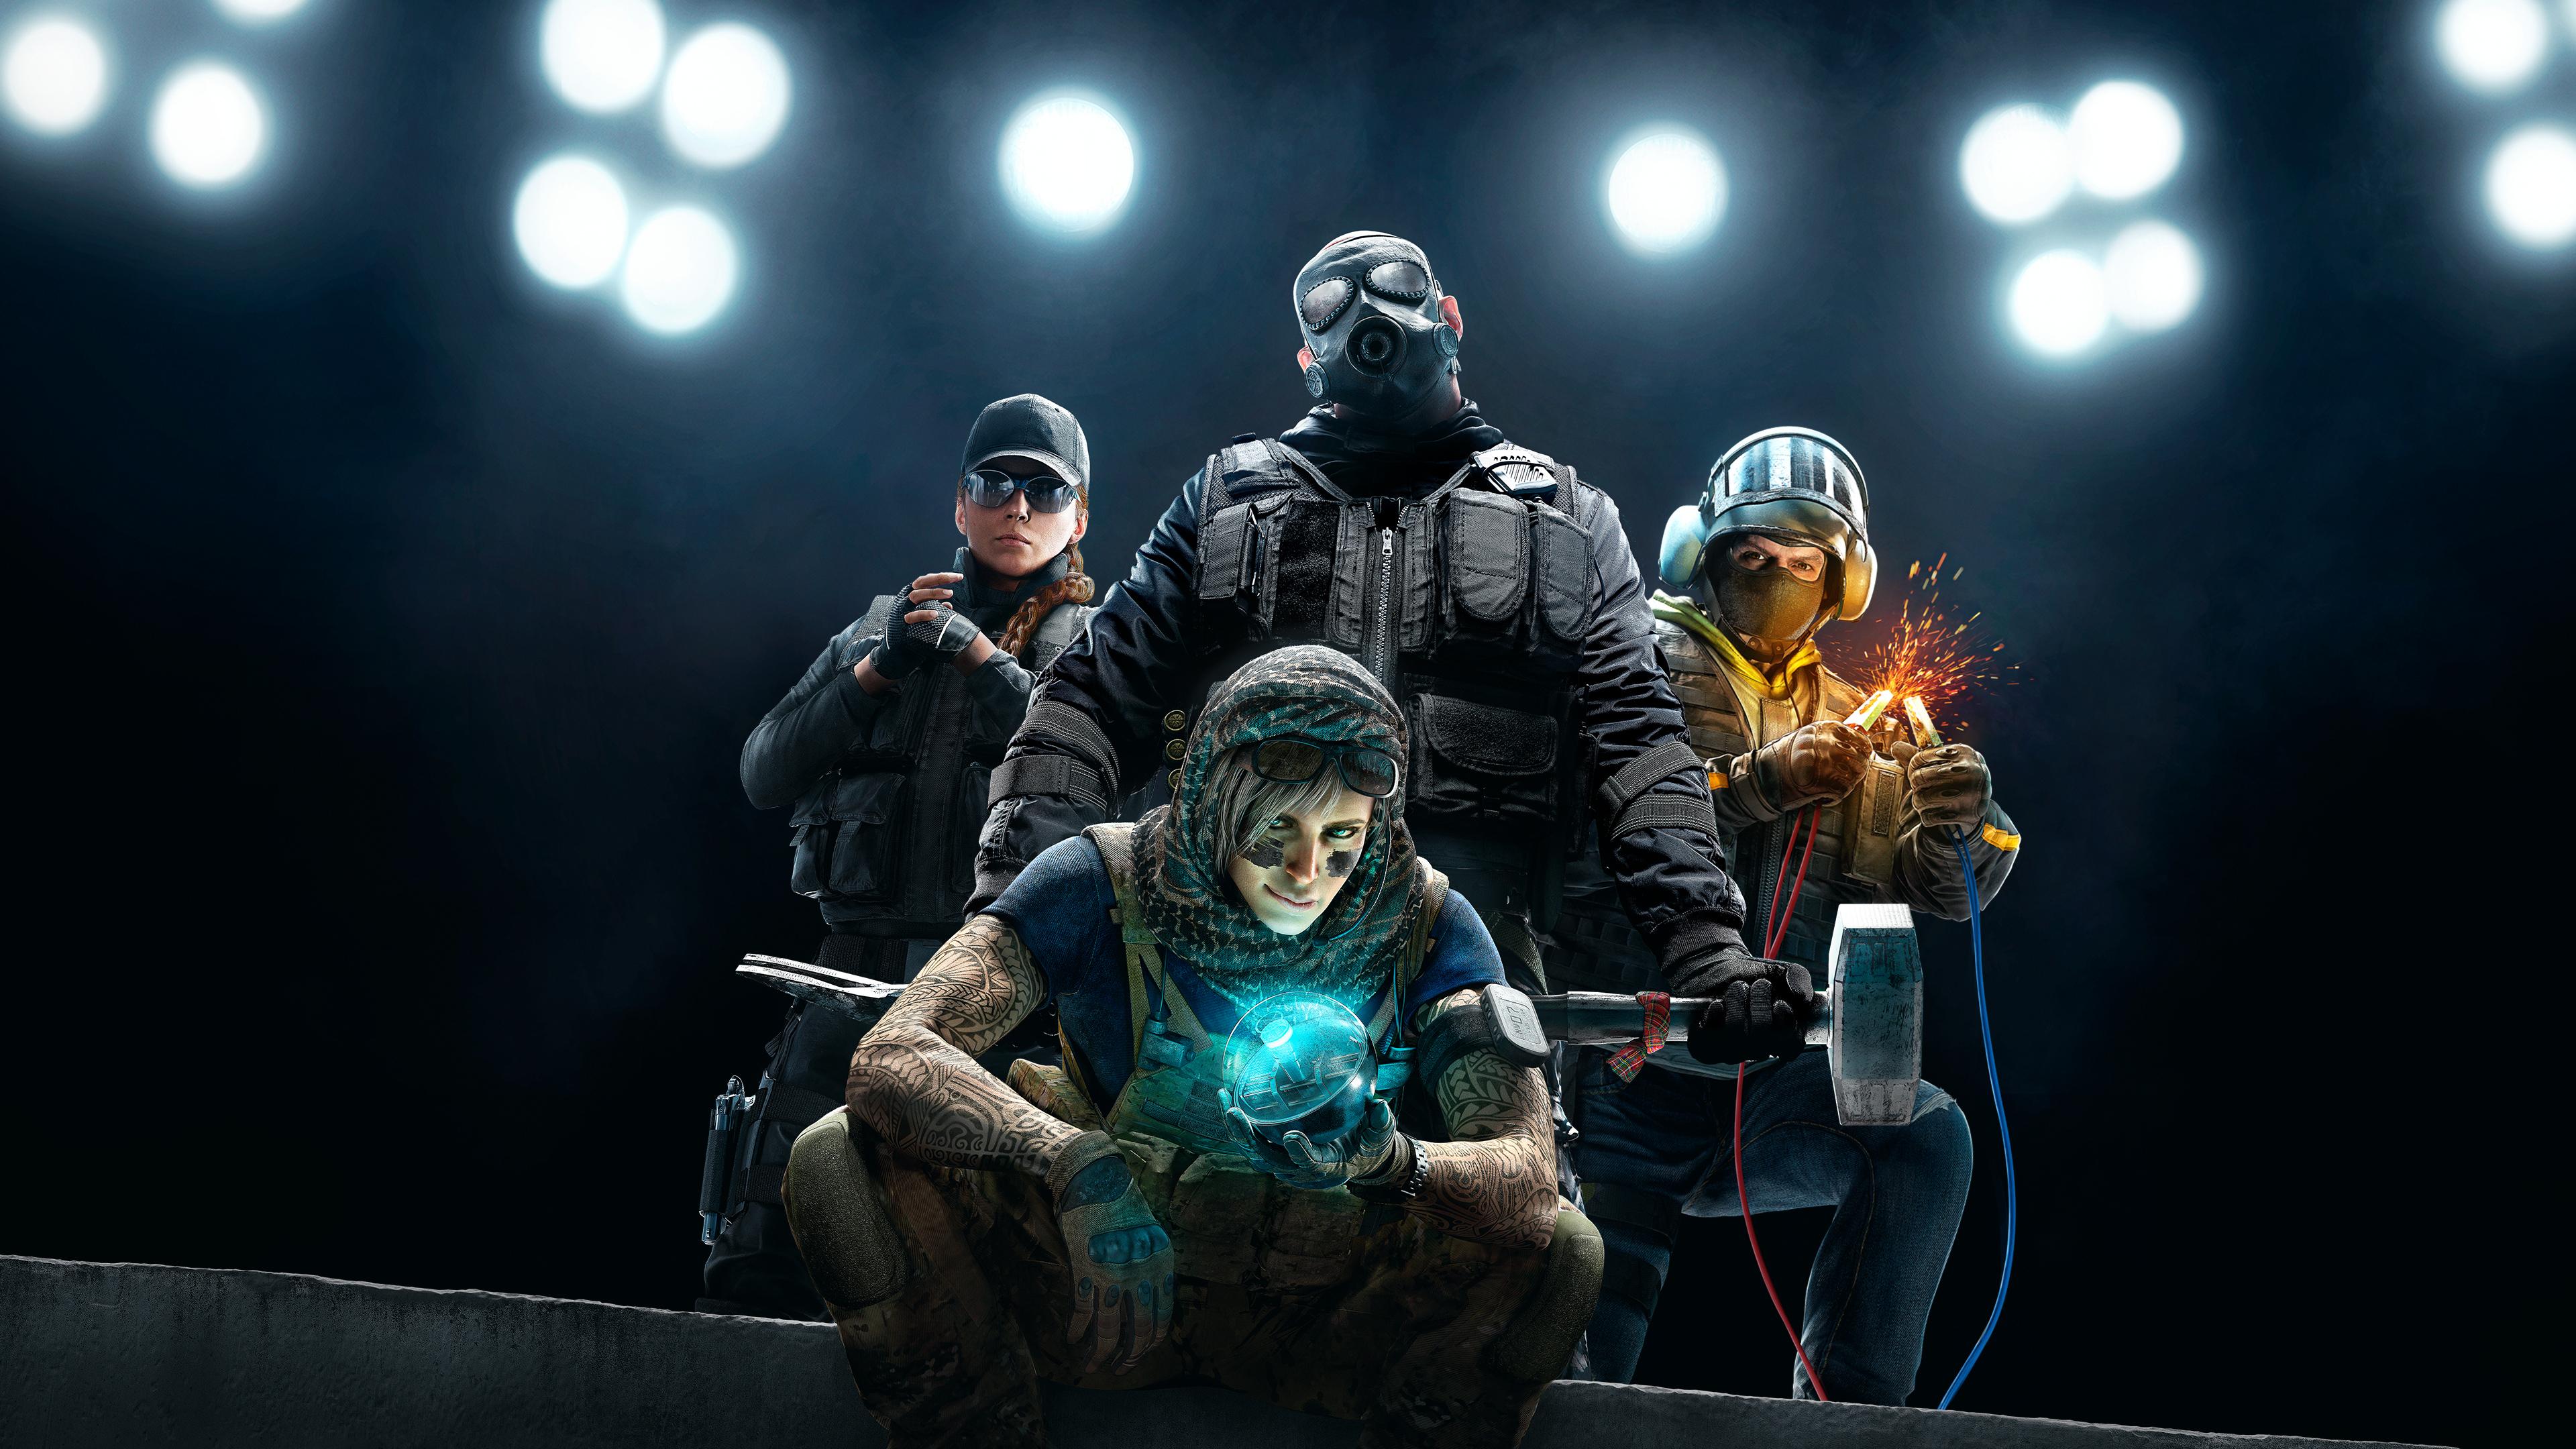 Tom Clancy's Rainbow Six Siege Wallpaper, HD Games 4K ...